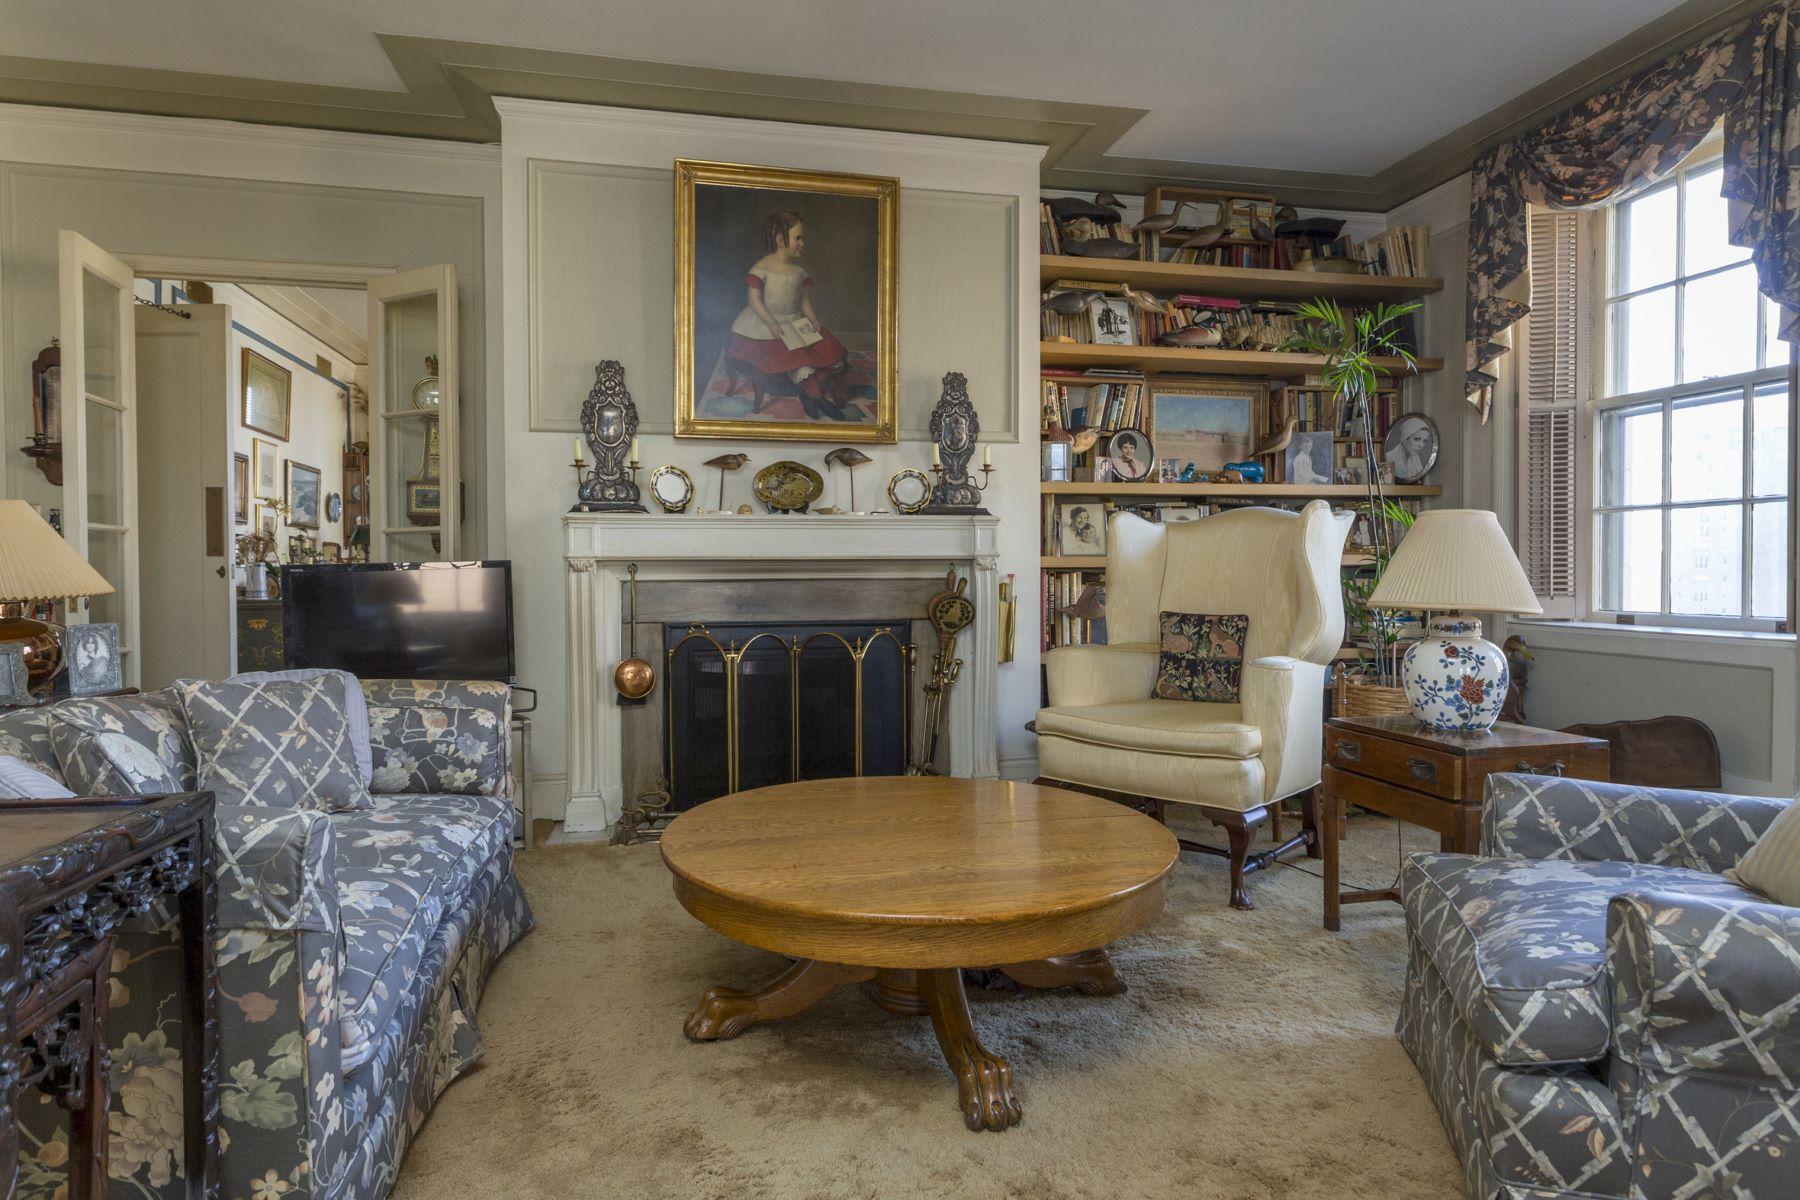 Condomínio para Venda às Rittenhouse Rarity 250 S 18TH ST 1201, Philadelphia, Pensilvânia, 19103 Estados Unidos